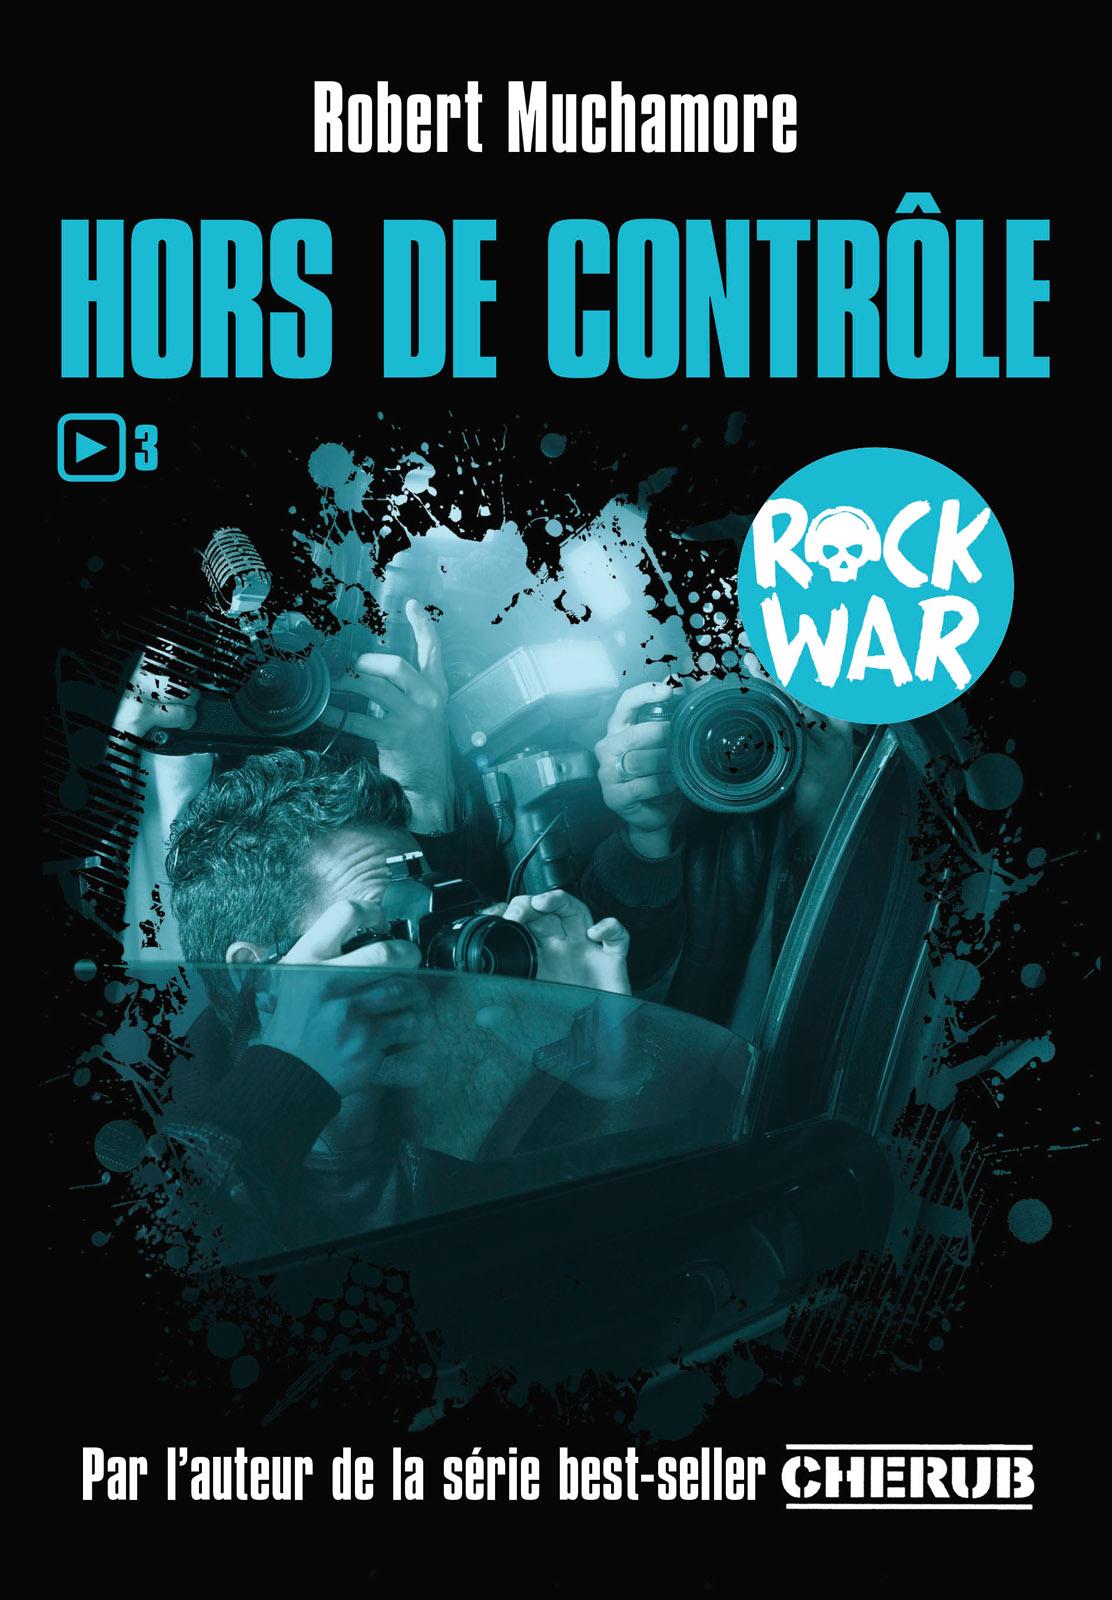 Rock War (Tome 3) - Hors de contrôle | Muchamore, Robert